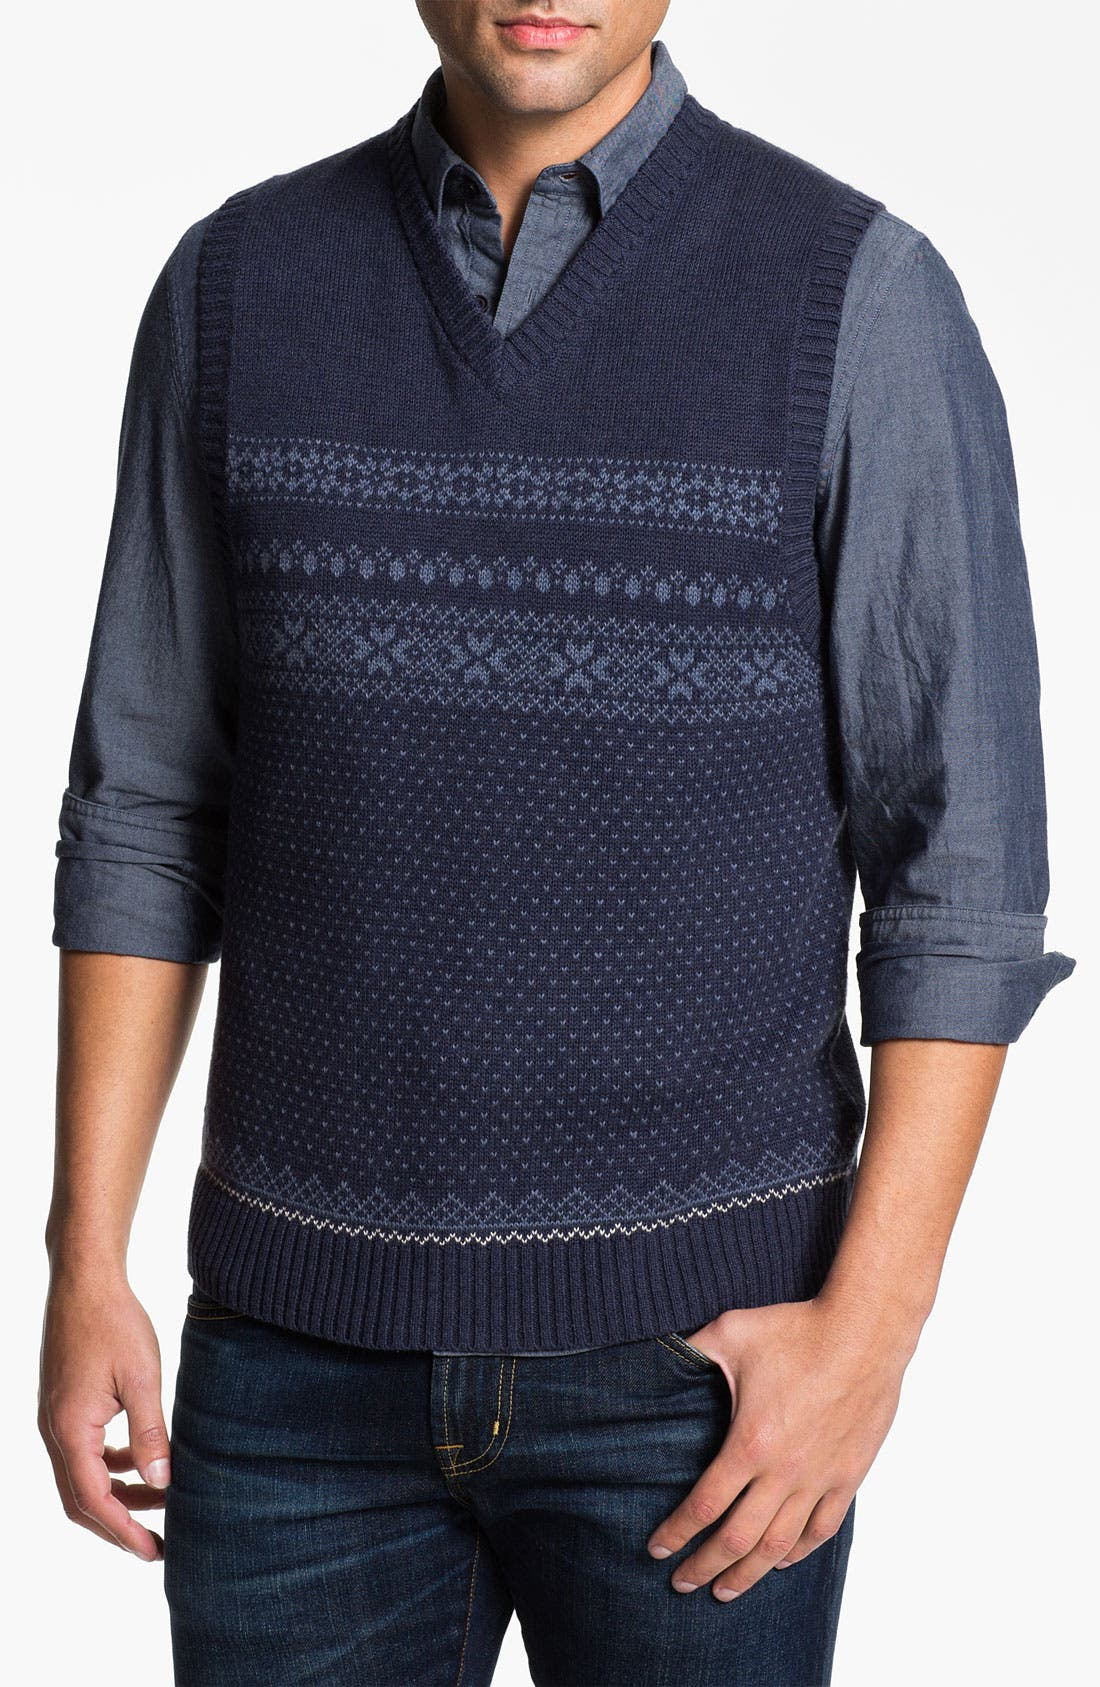 Main Image - Wallin & Bros. Fair Isle V-Neck Sweater Vest